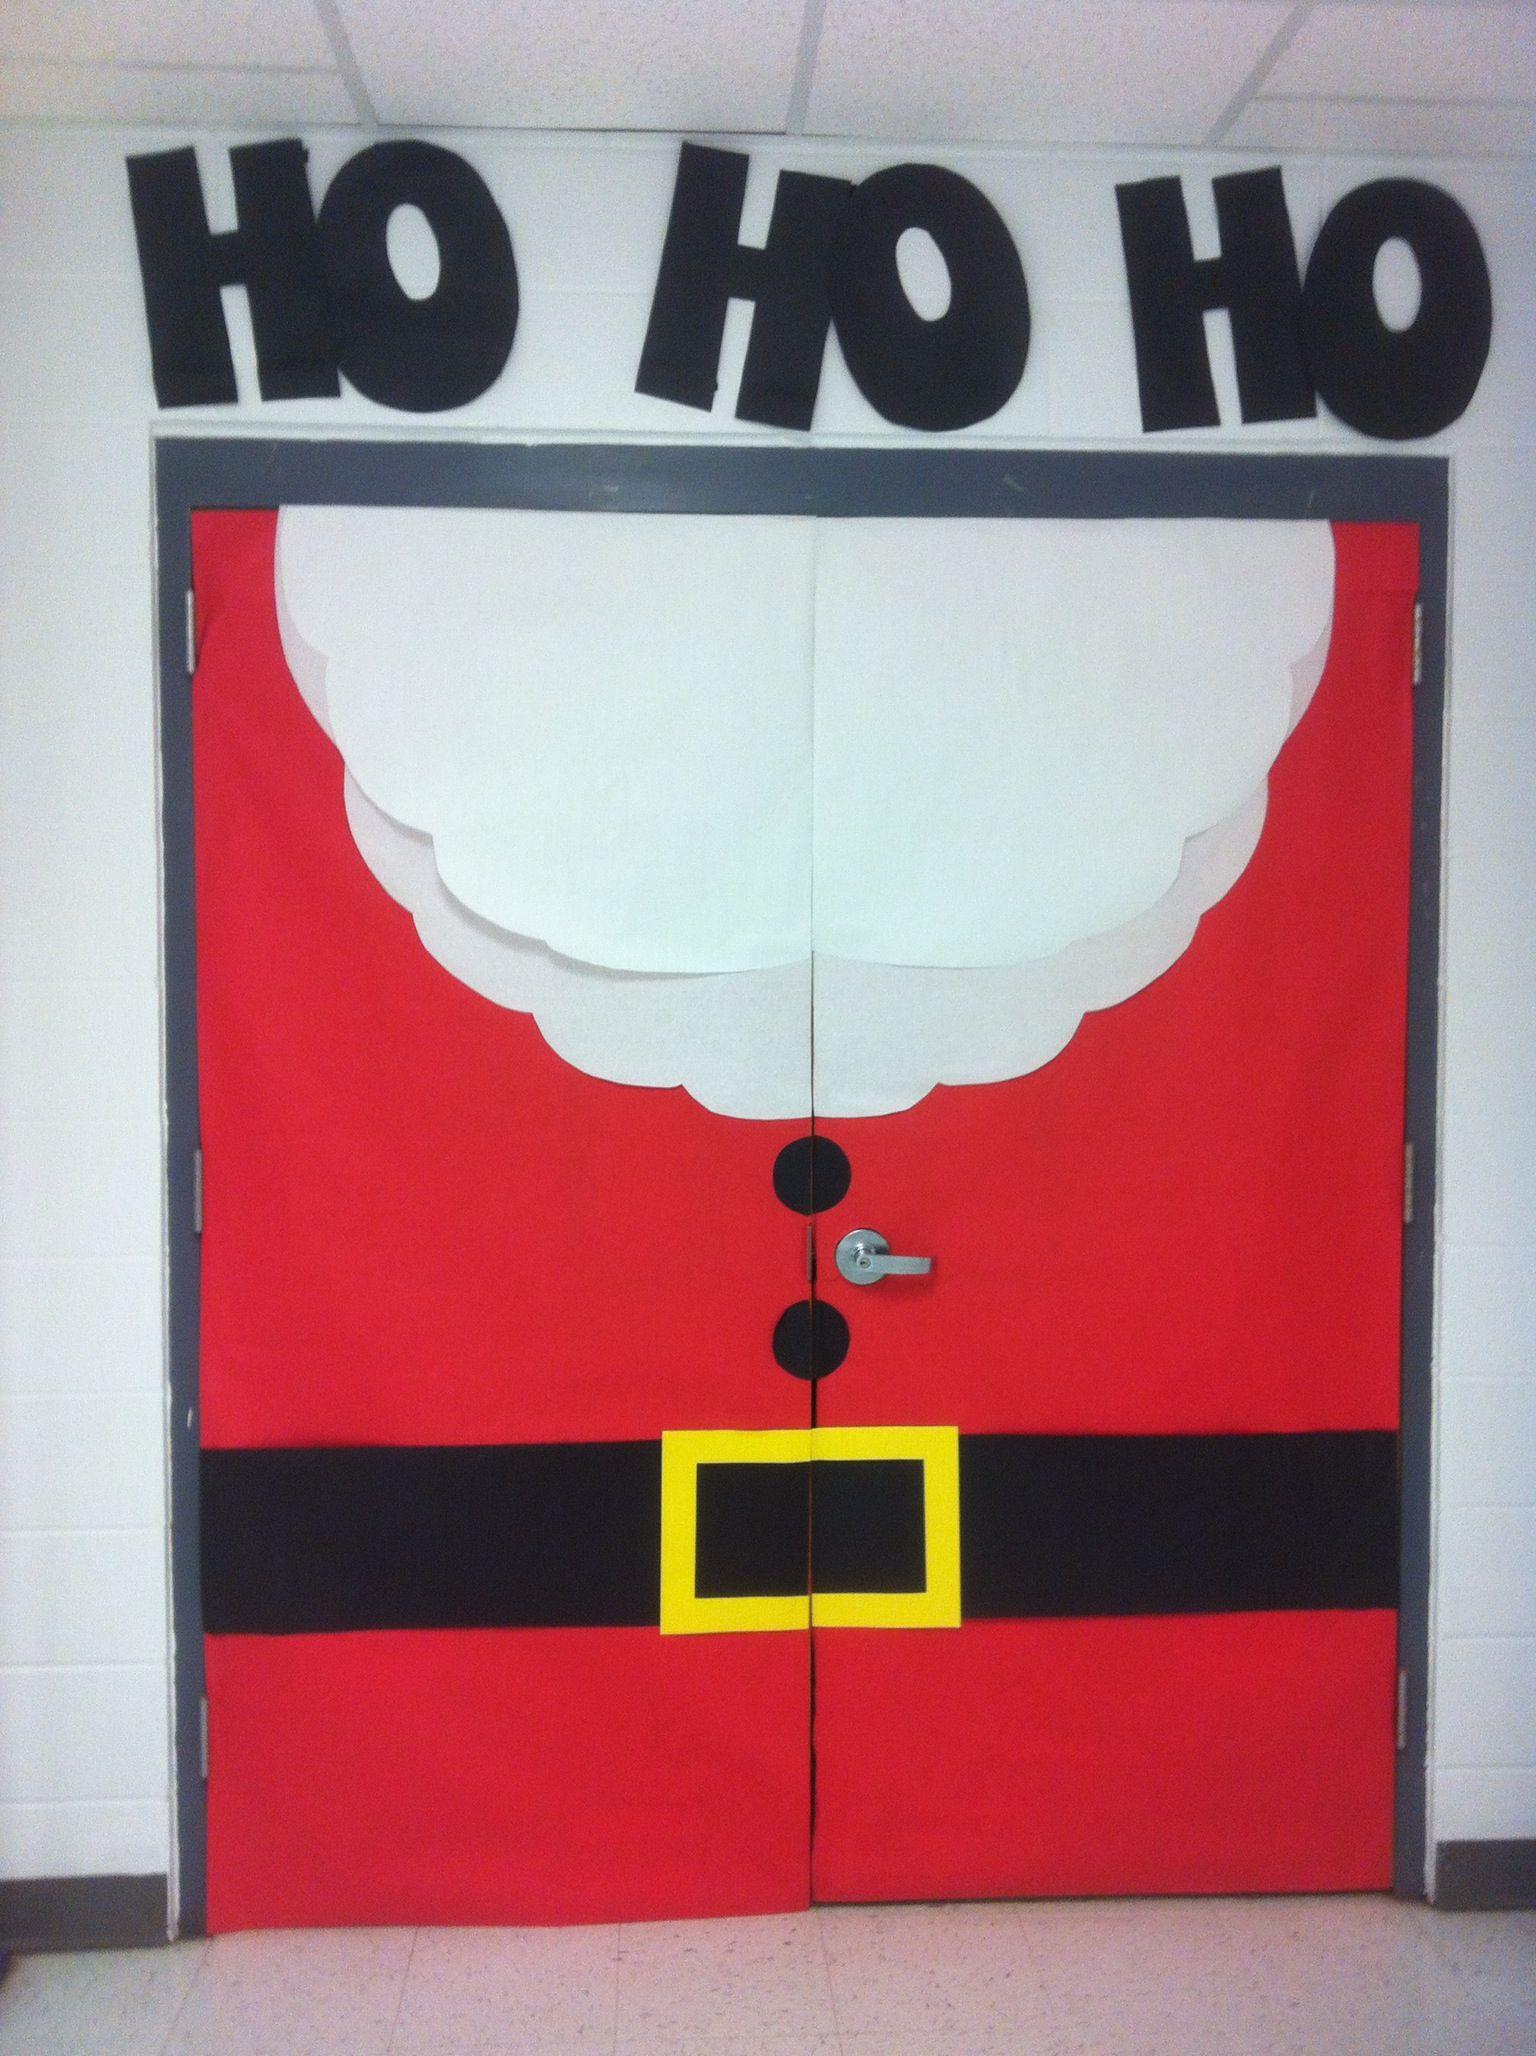 Loving Santa On My Classroom Doors This Christmas Christmas Classroom Door Classroom Christmas Decorations Christmas Door Decorations